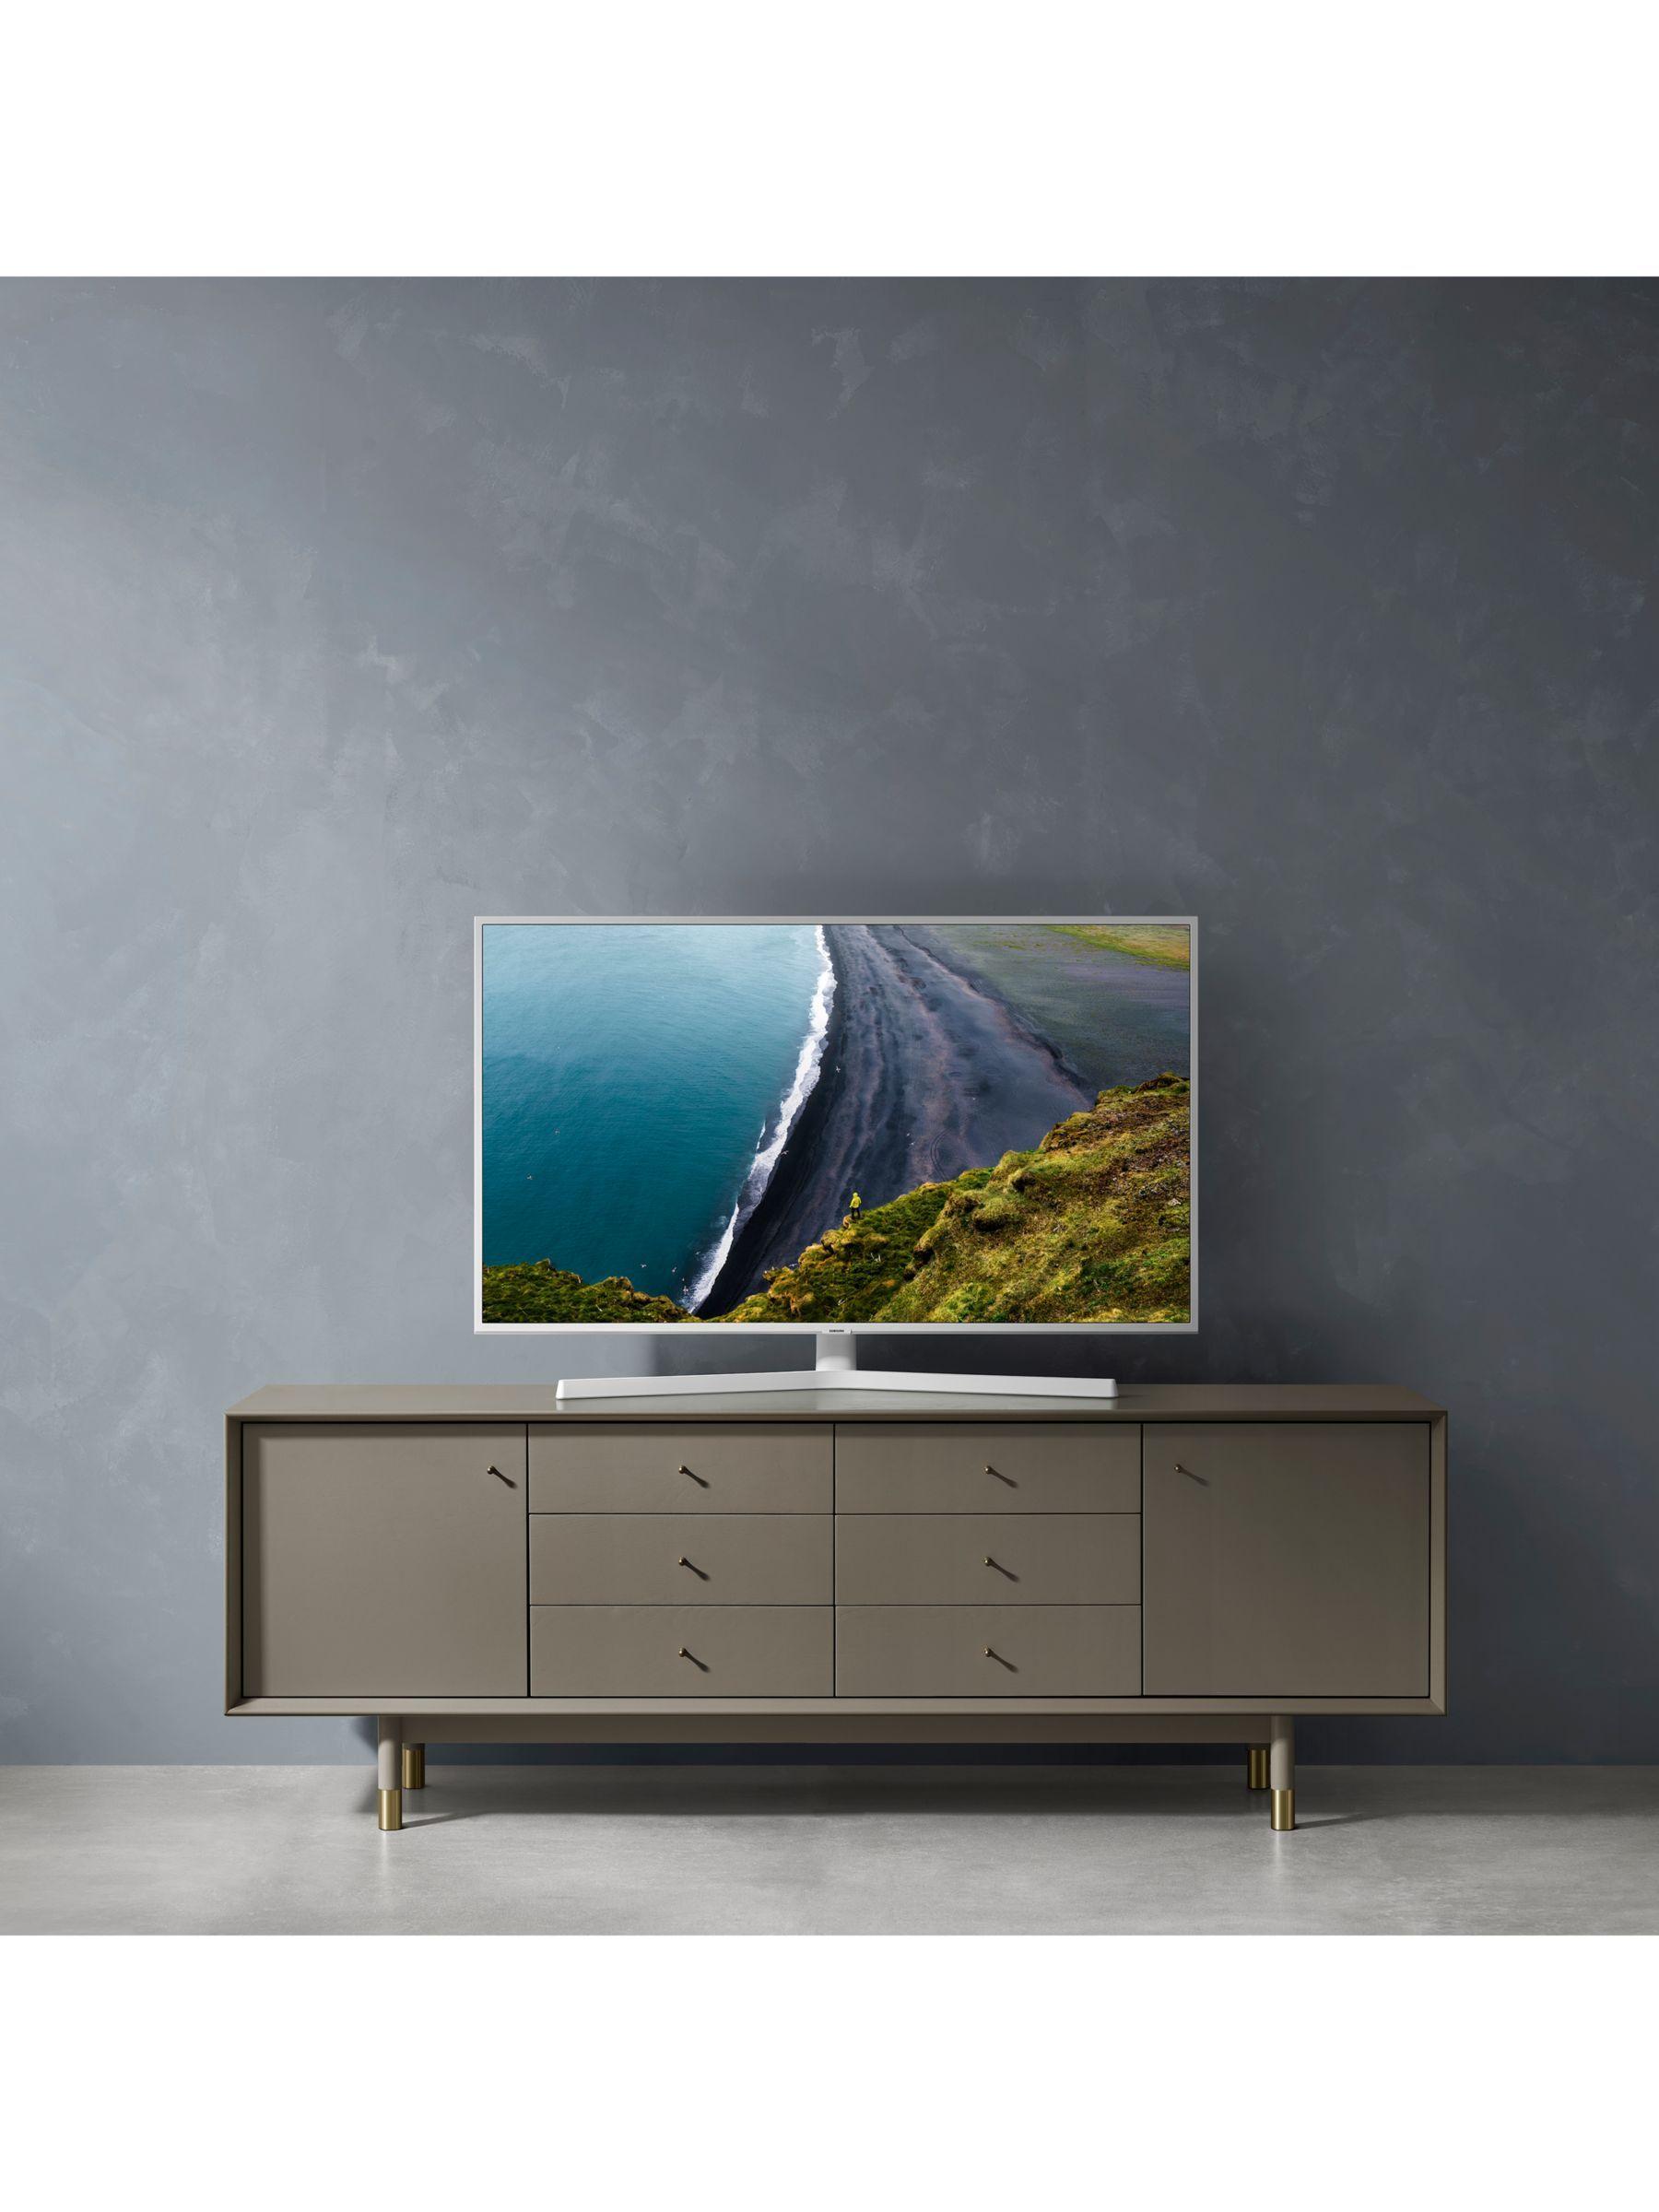 Samsung Ue50ru7410 2019 Hdr 4k Ultra Hd Smart Tv 50 With